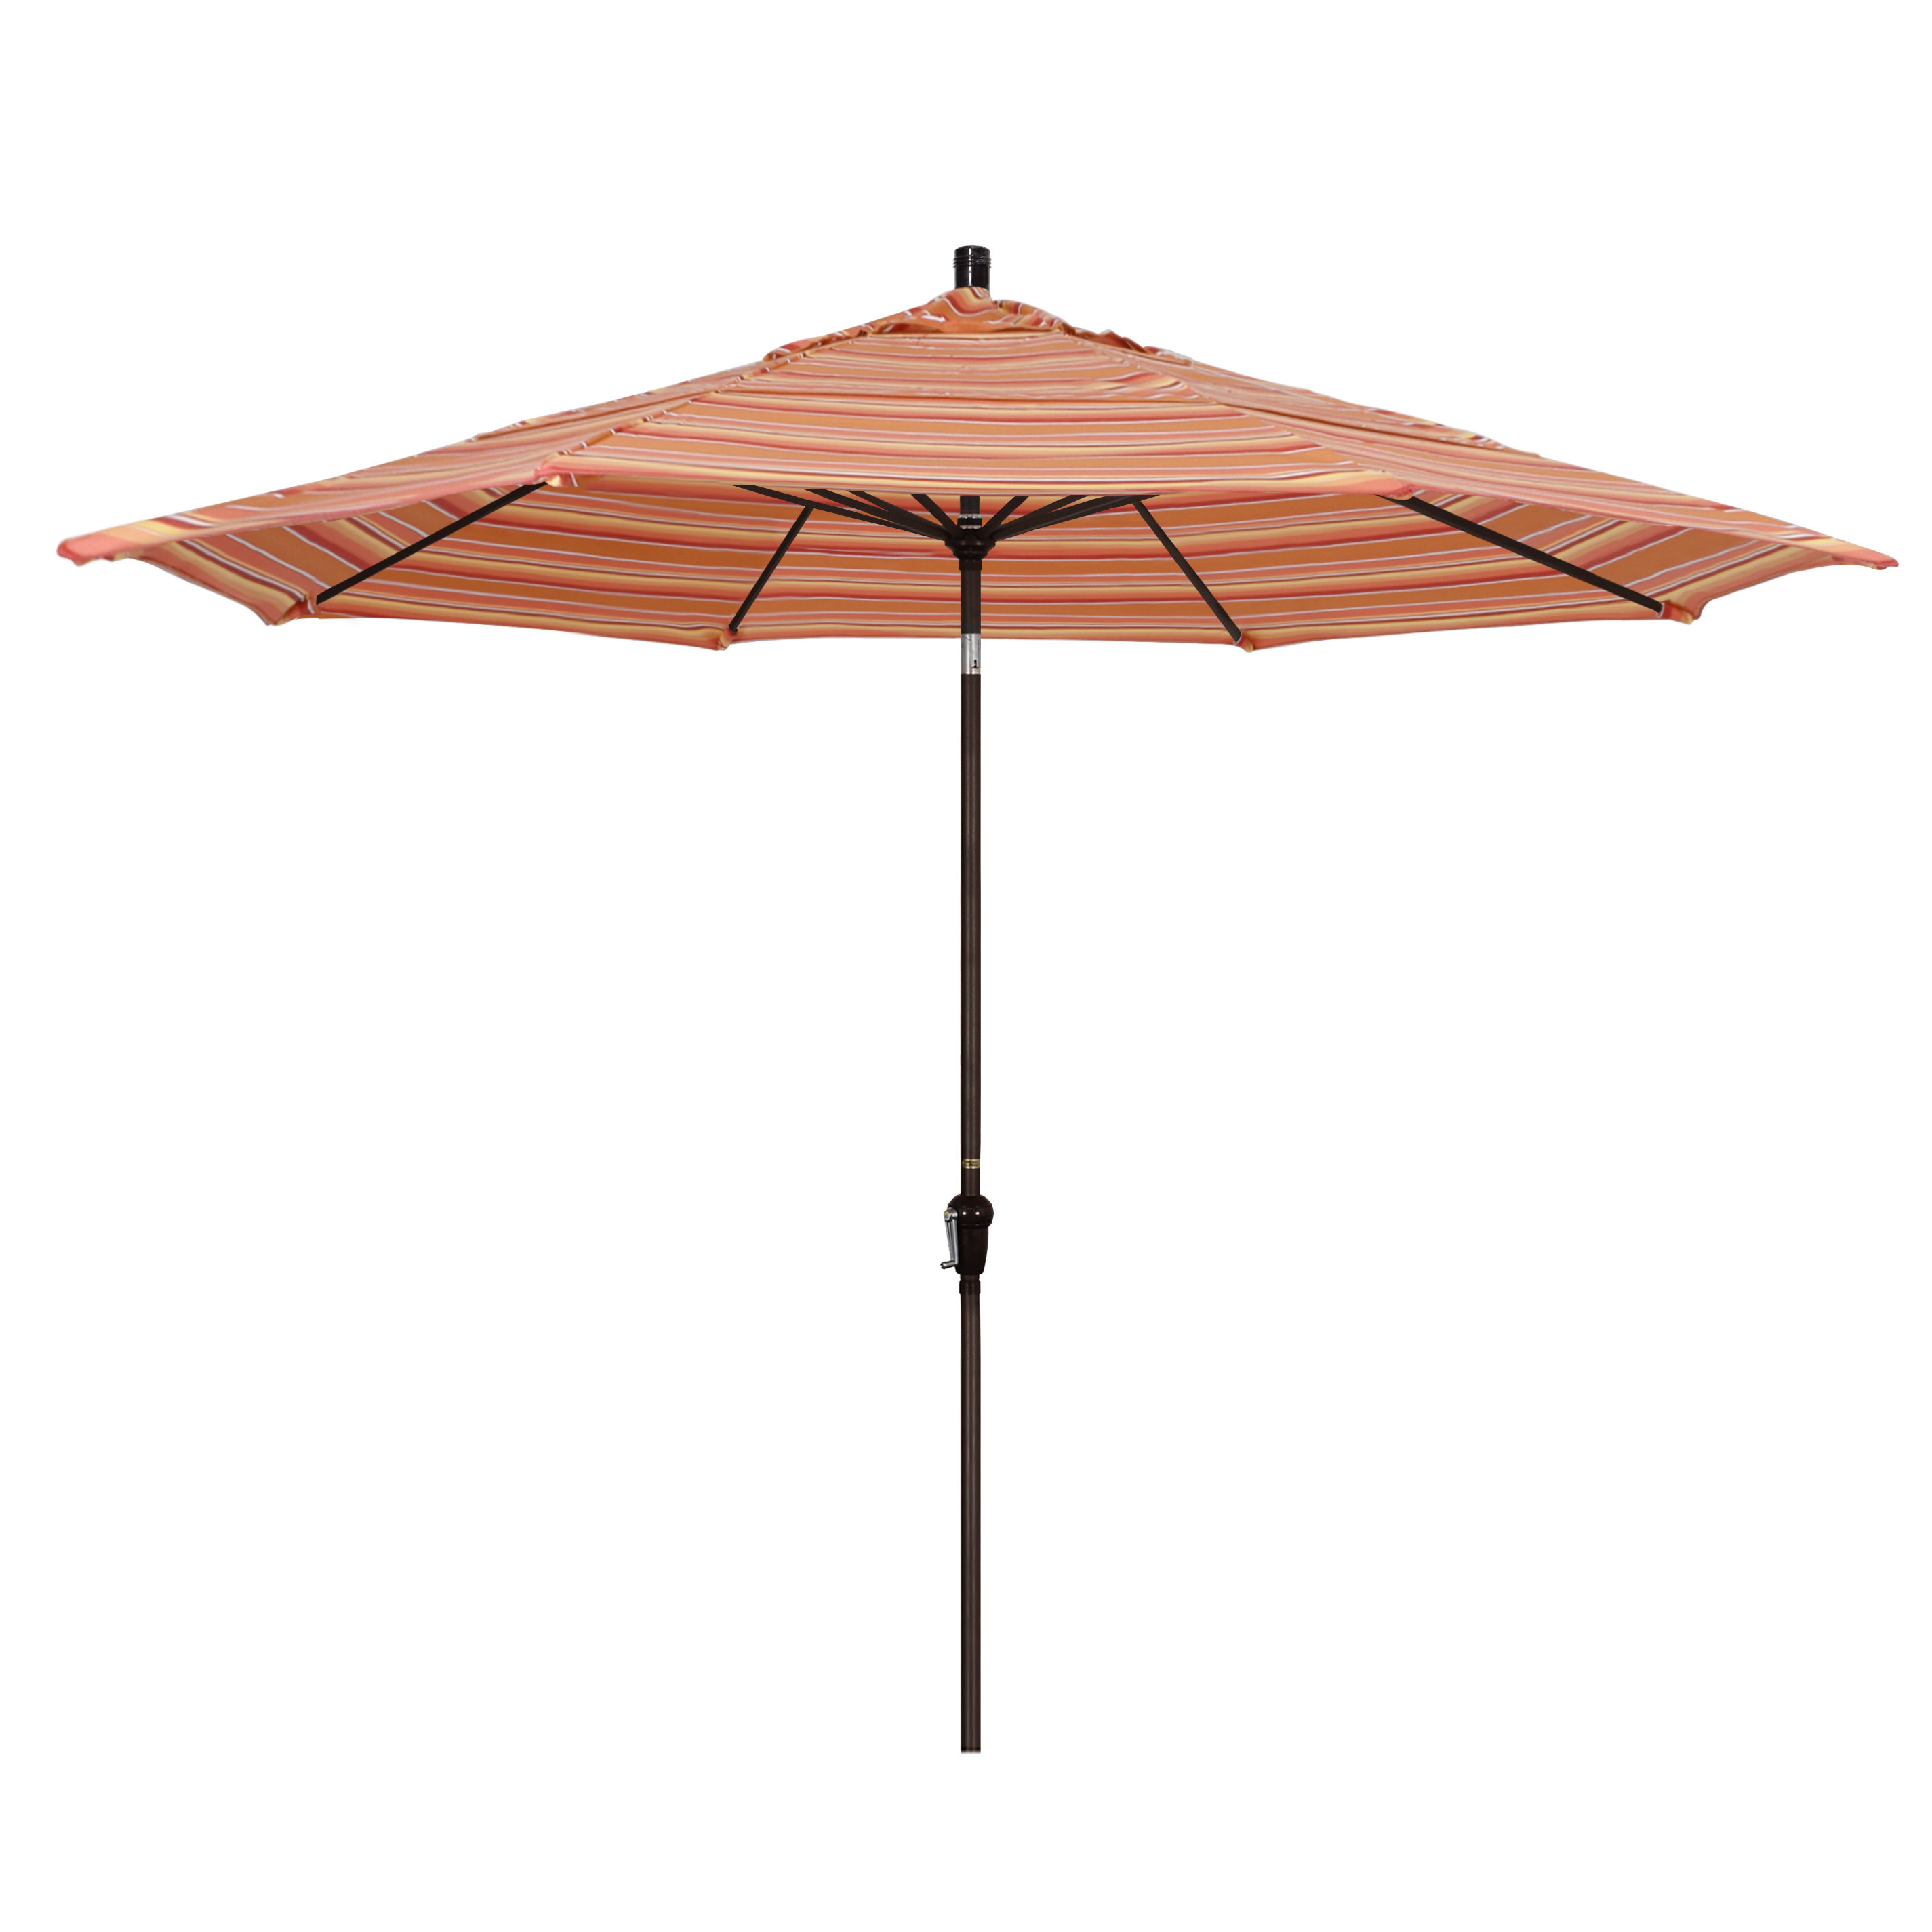 Fashionable Mullaney 11' Market Sunbrella Umbrella Regarding Mullaney Market Umbrellas (View 7 of 20)